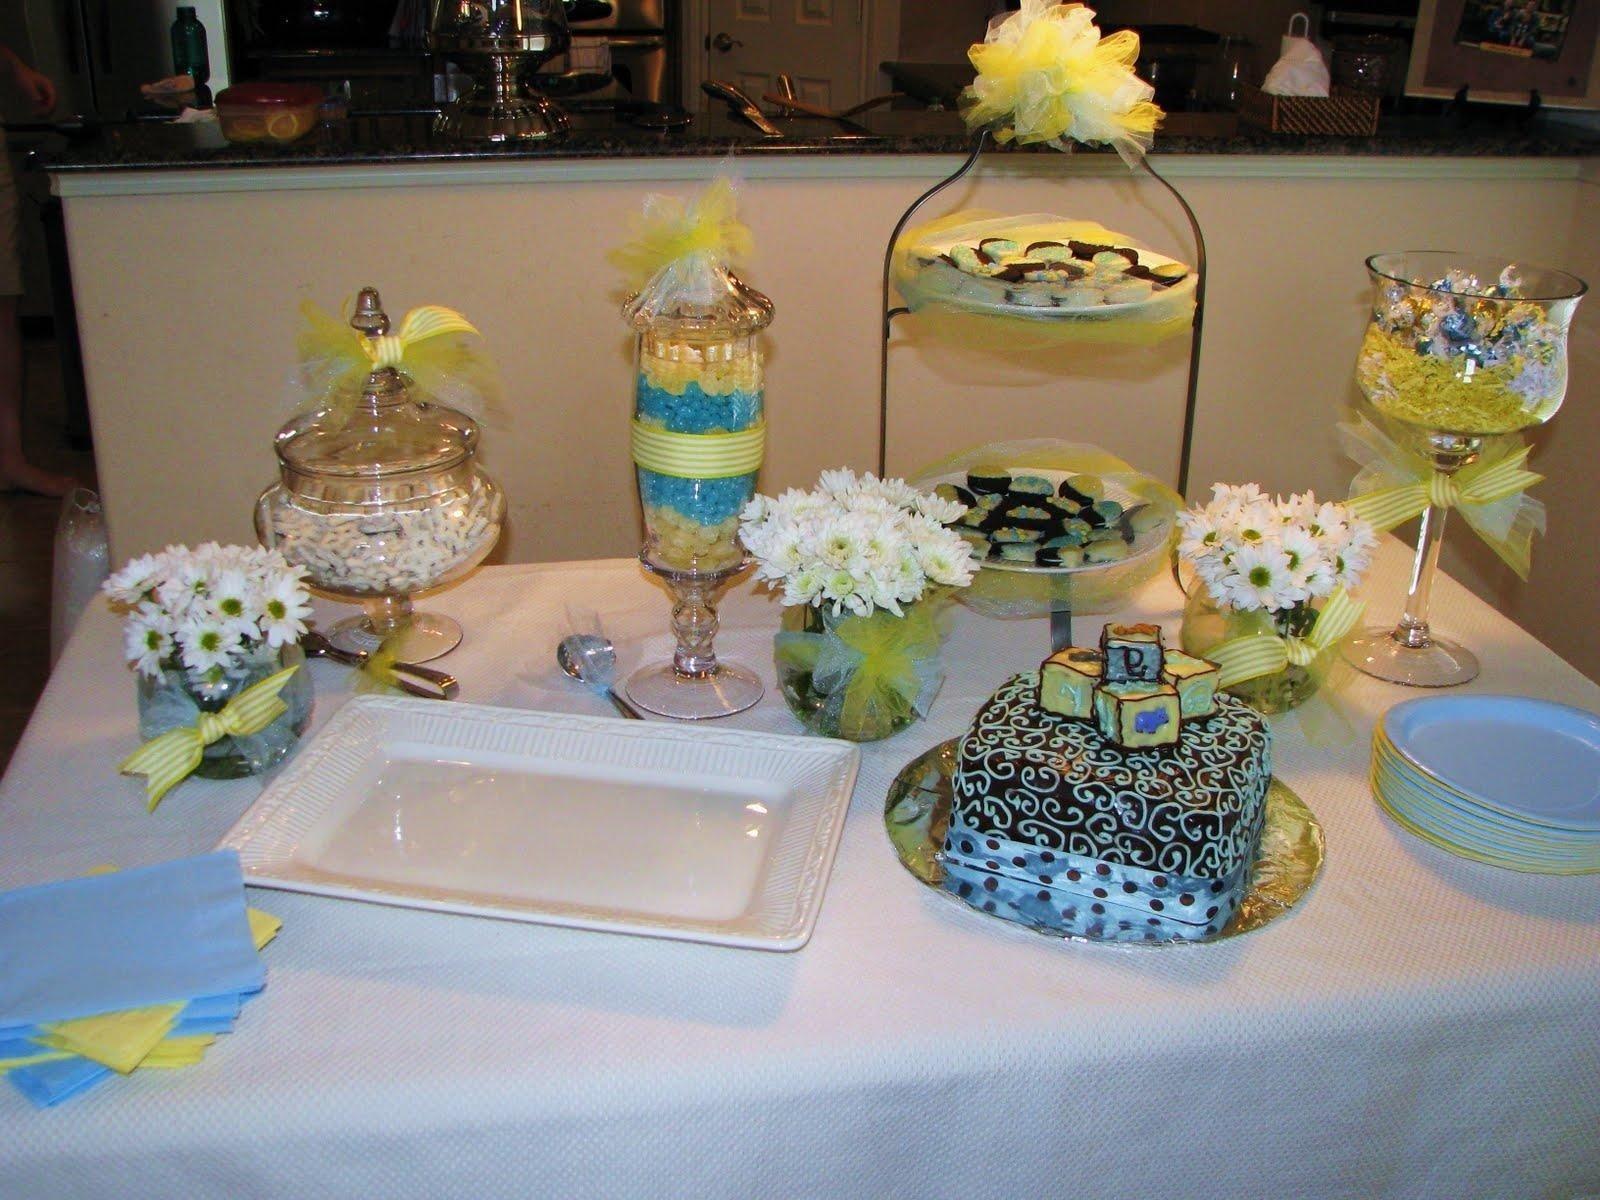 10 Spectacular 35Th Wedding Anniversary Party Ideas wedding world 25th wedding anniversary gift ideas for men 1 2020